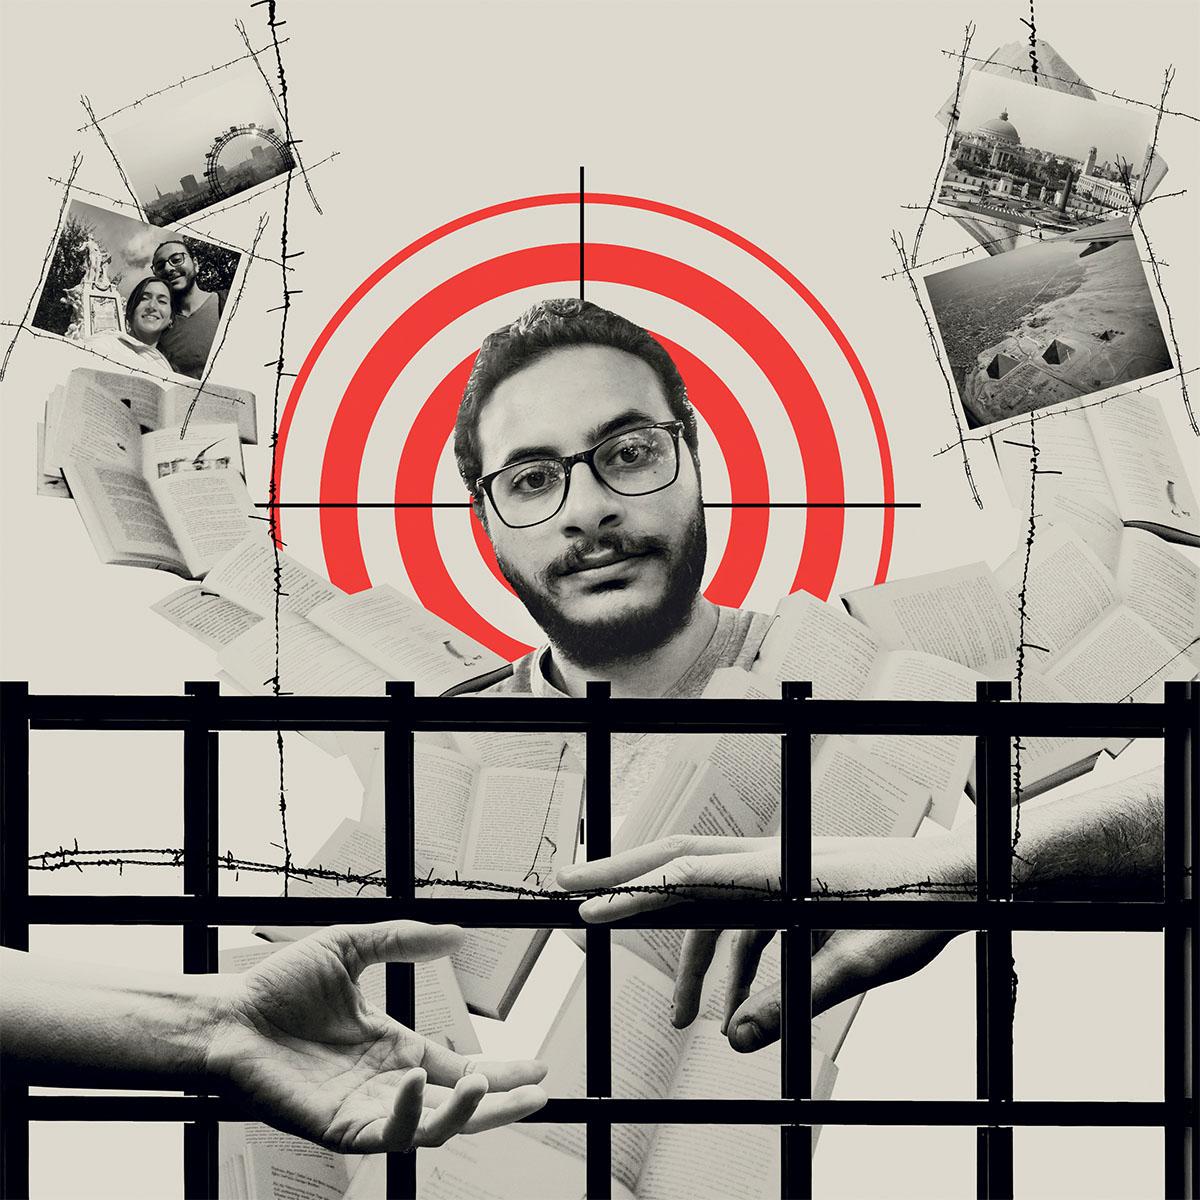 Ägypter in Haft